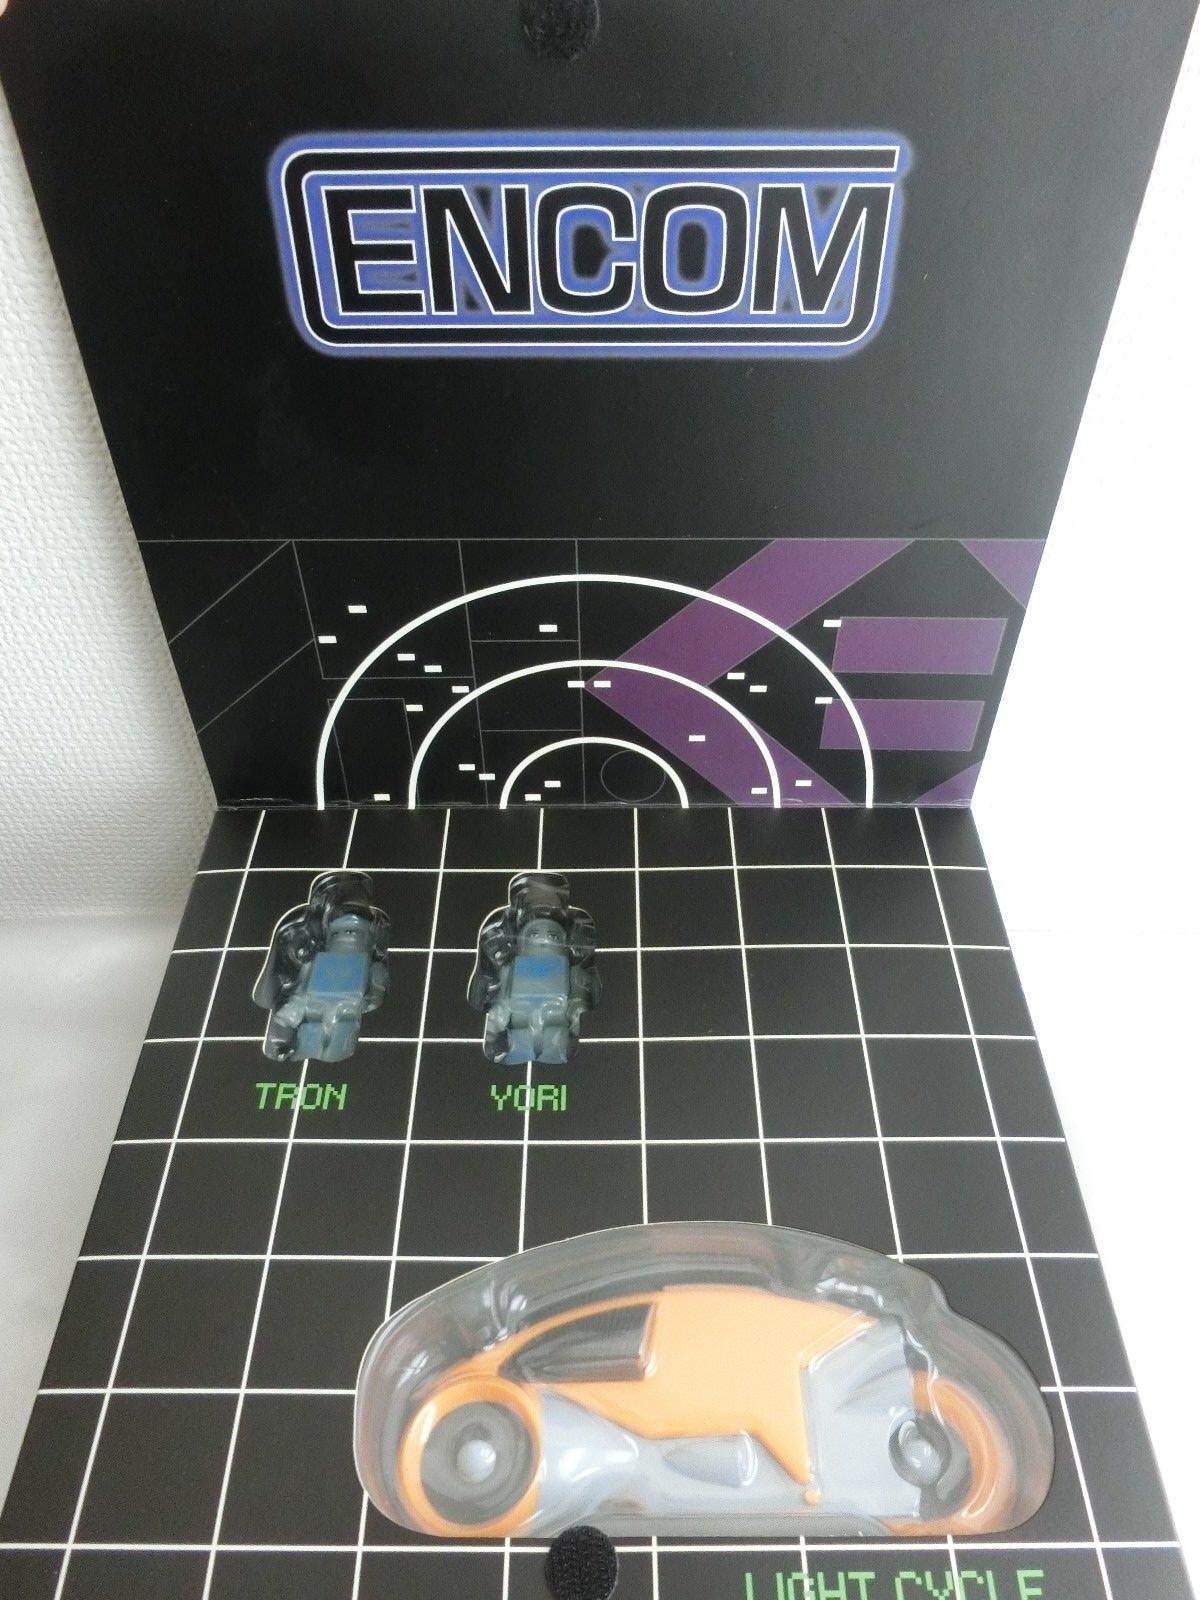 Kubrick Tron Set (a) Tron no grites Luz ciclo Encom Medi com Figura de juguete nuevo F S